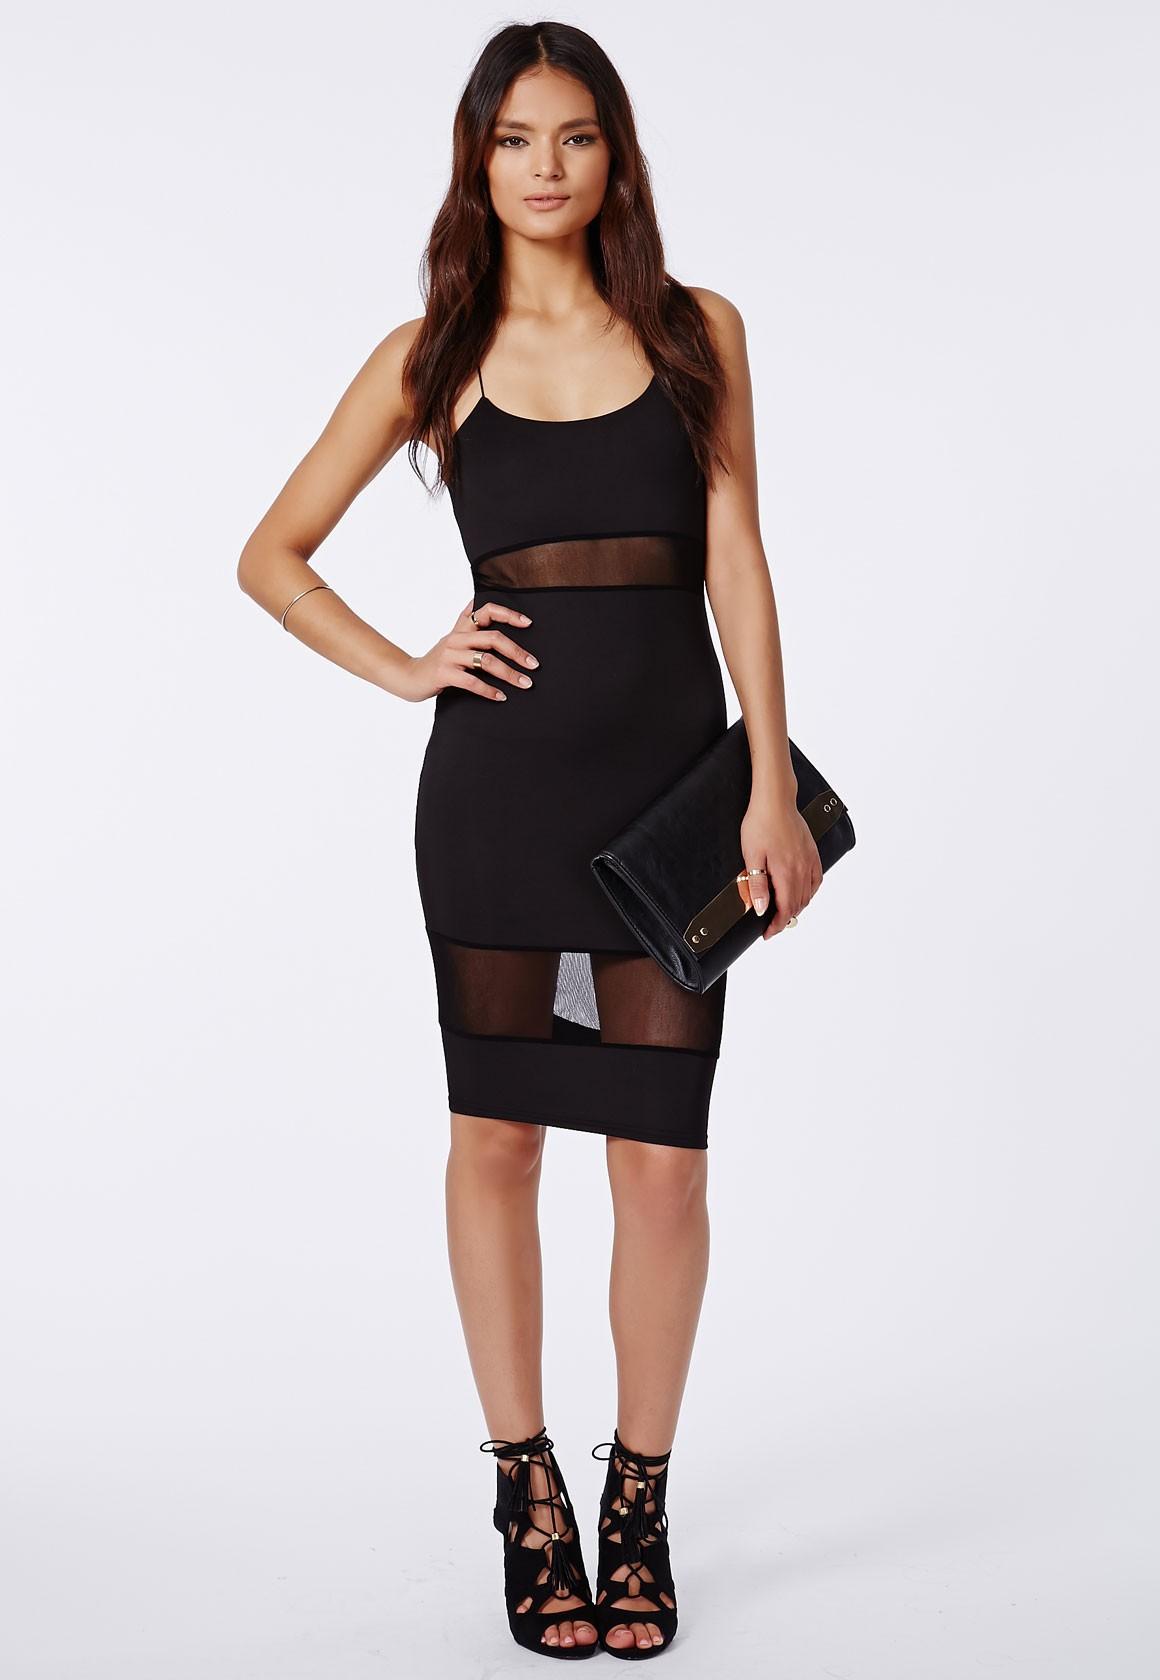 Mesh Dress Picture Collection Dressedupgirl Com